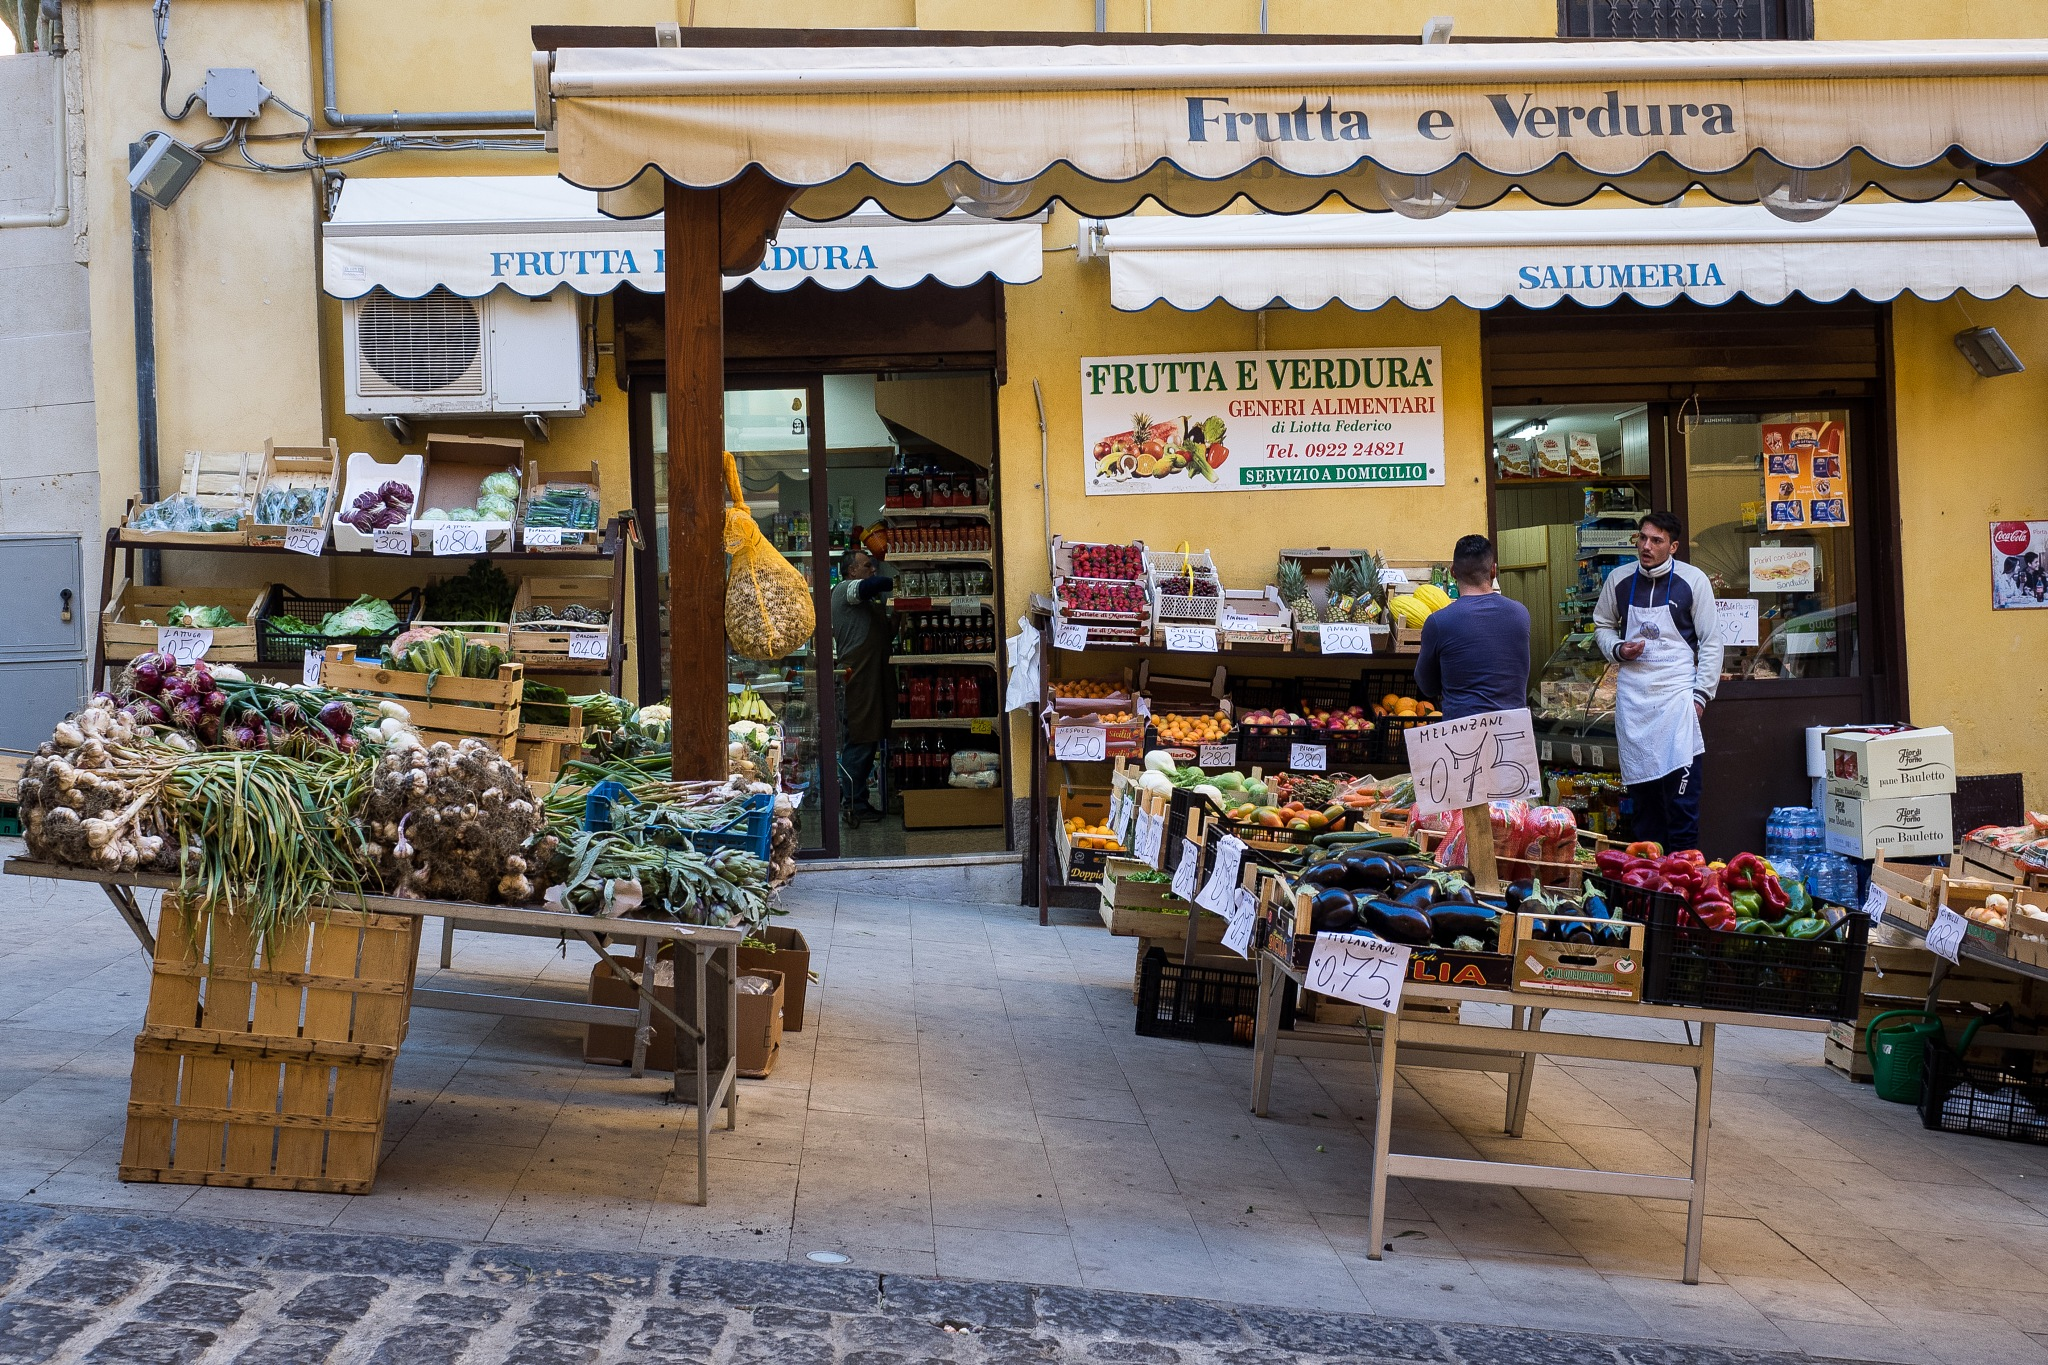 Frutta e Verdura by Werner Hofmann